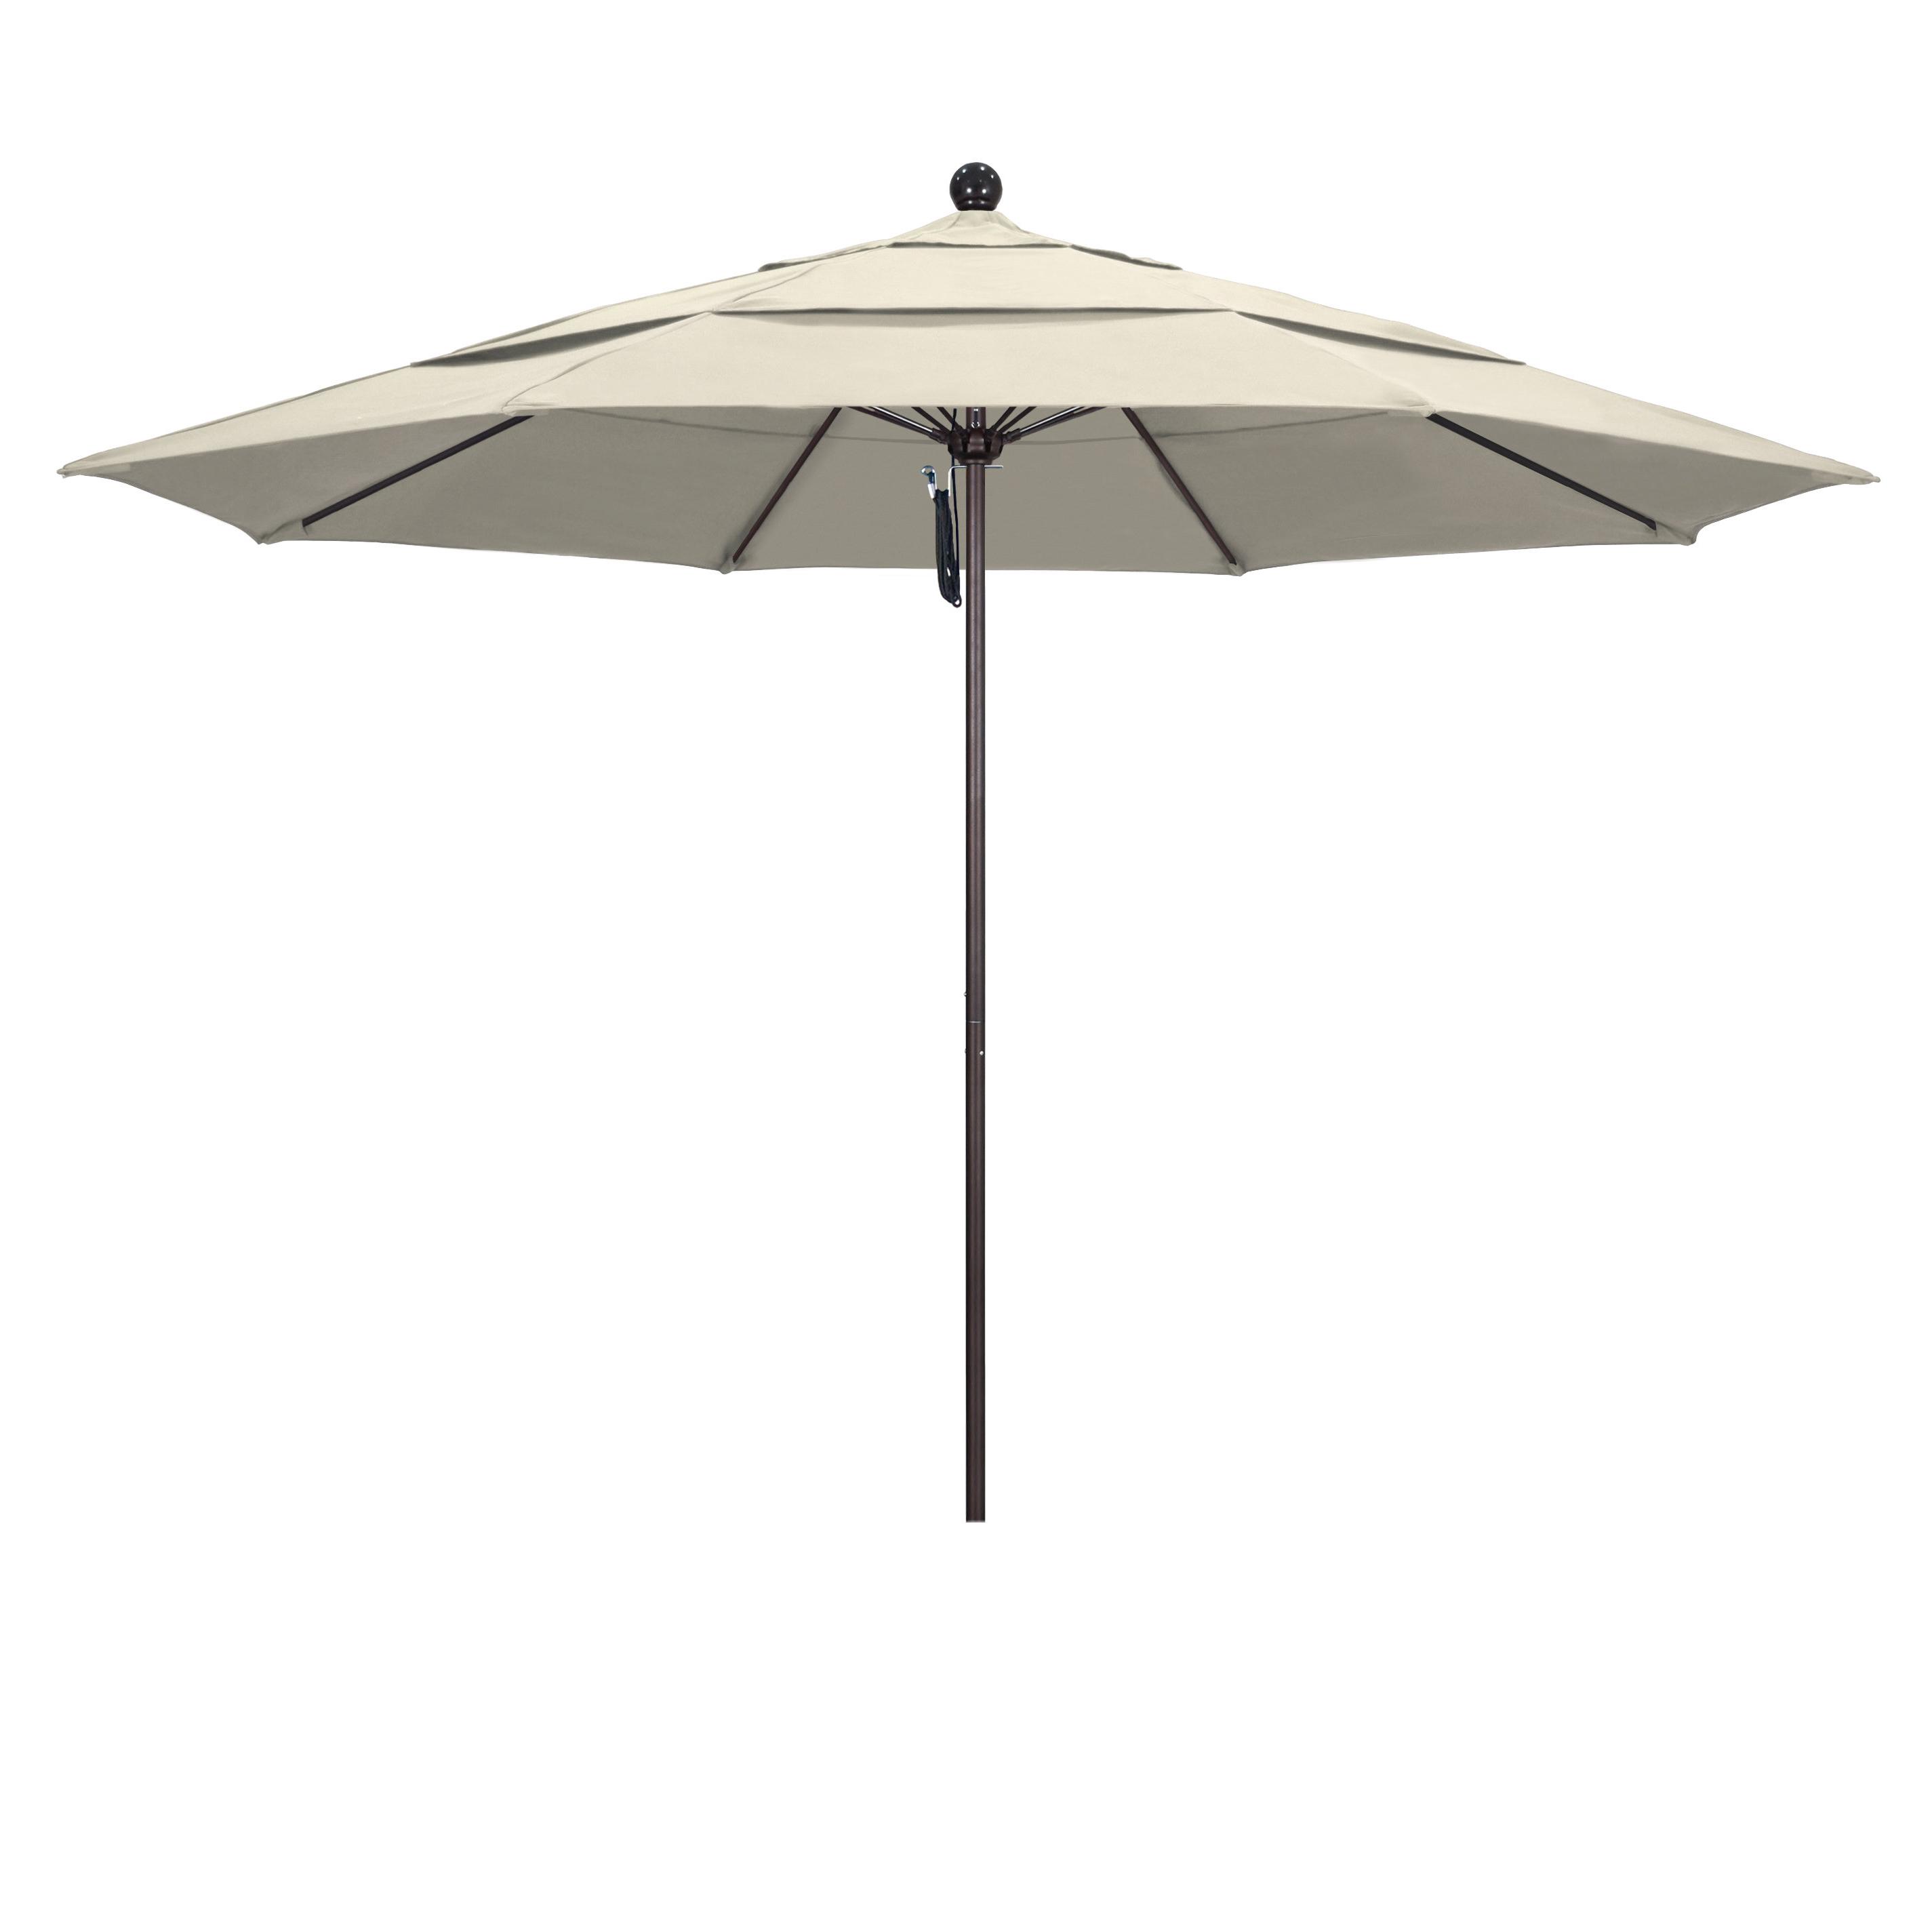 2019 Duxbury 11' Market Umbrella Inside Ryant Market Umbrellas (View 1 of 20)